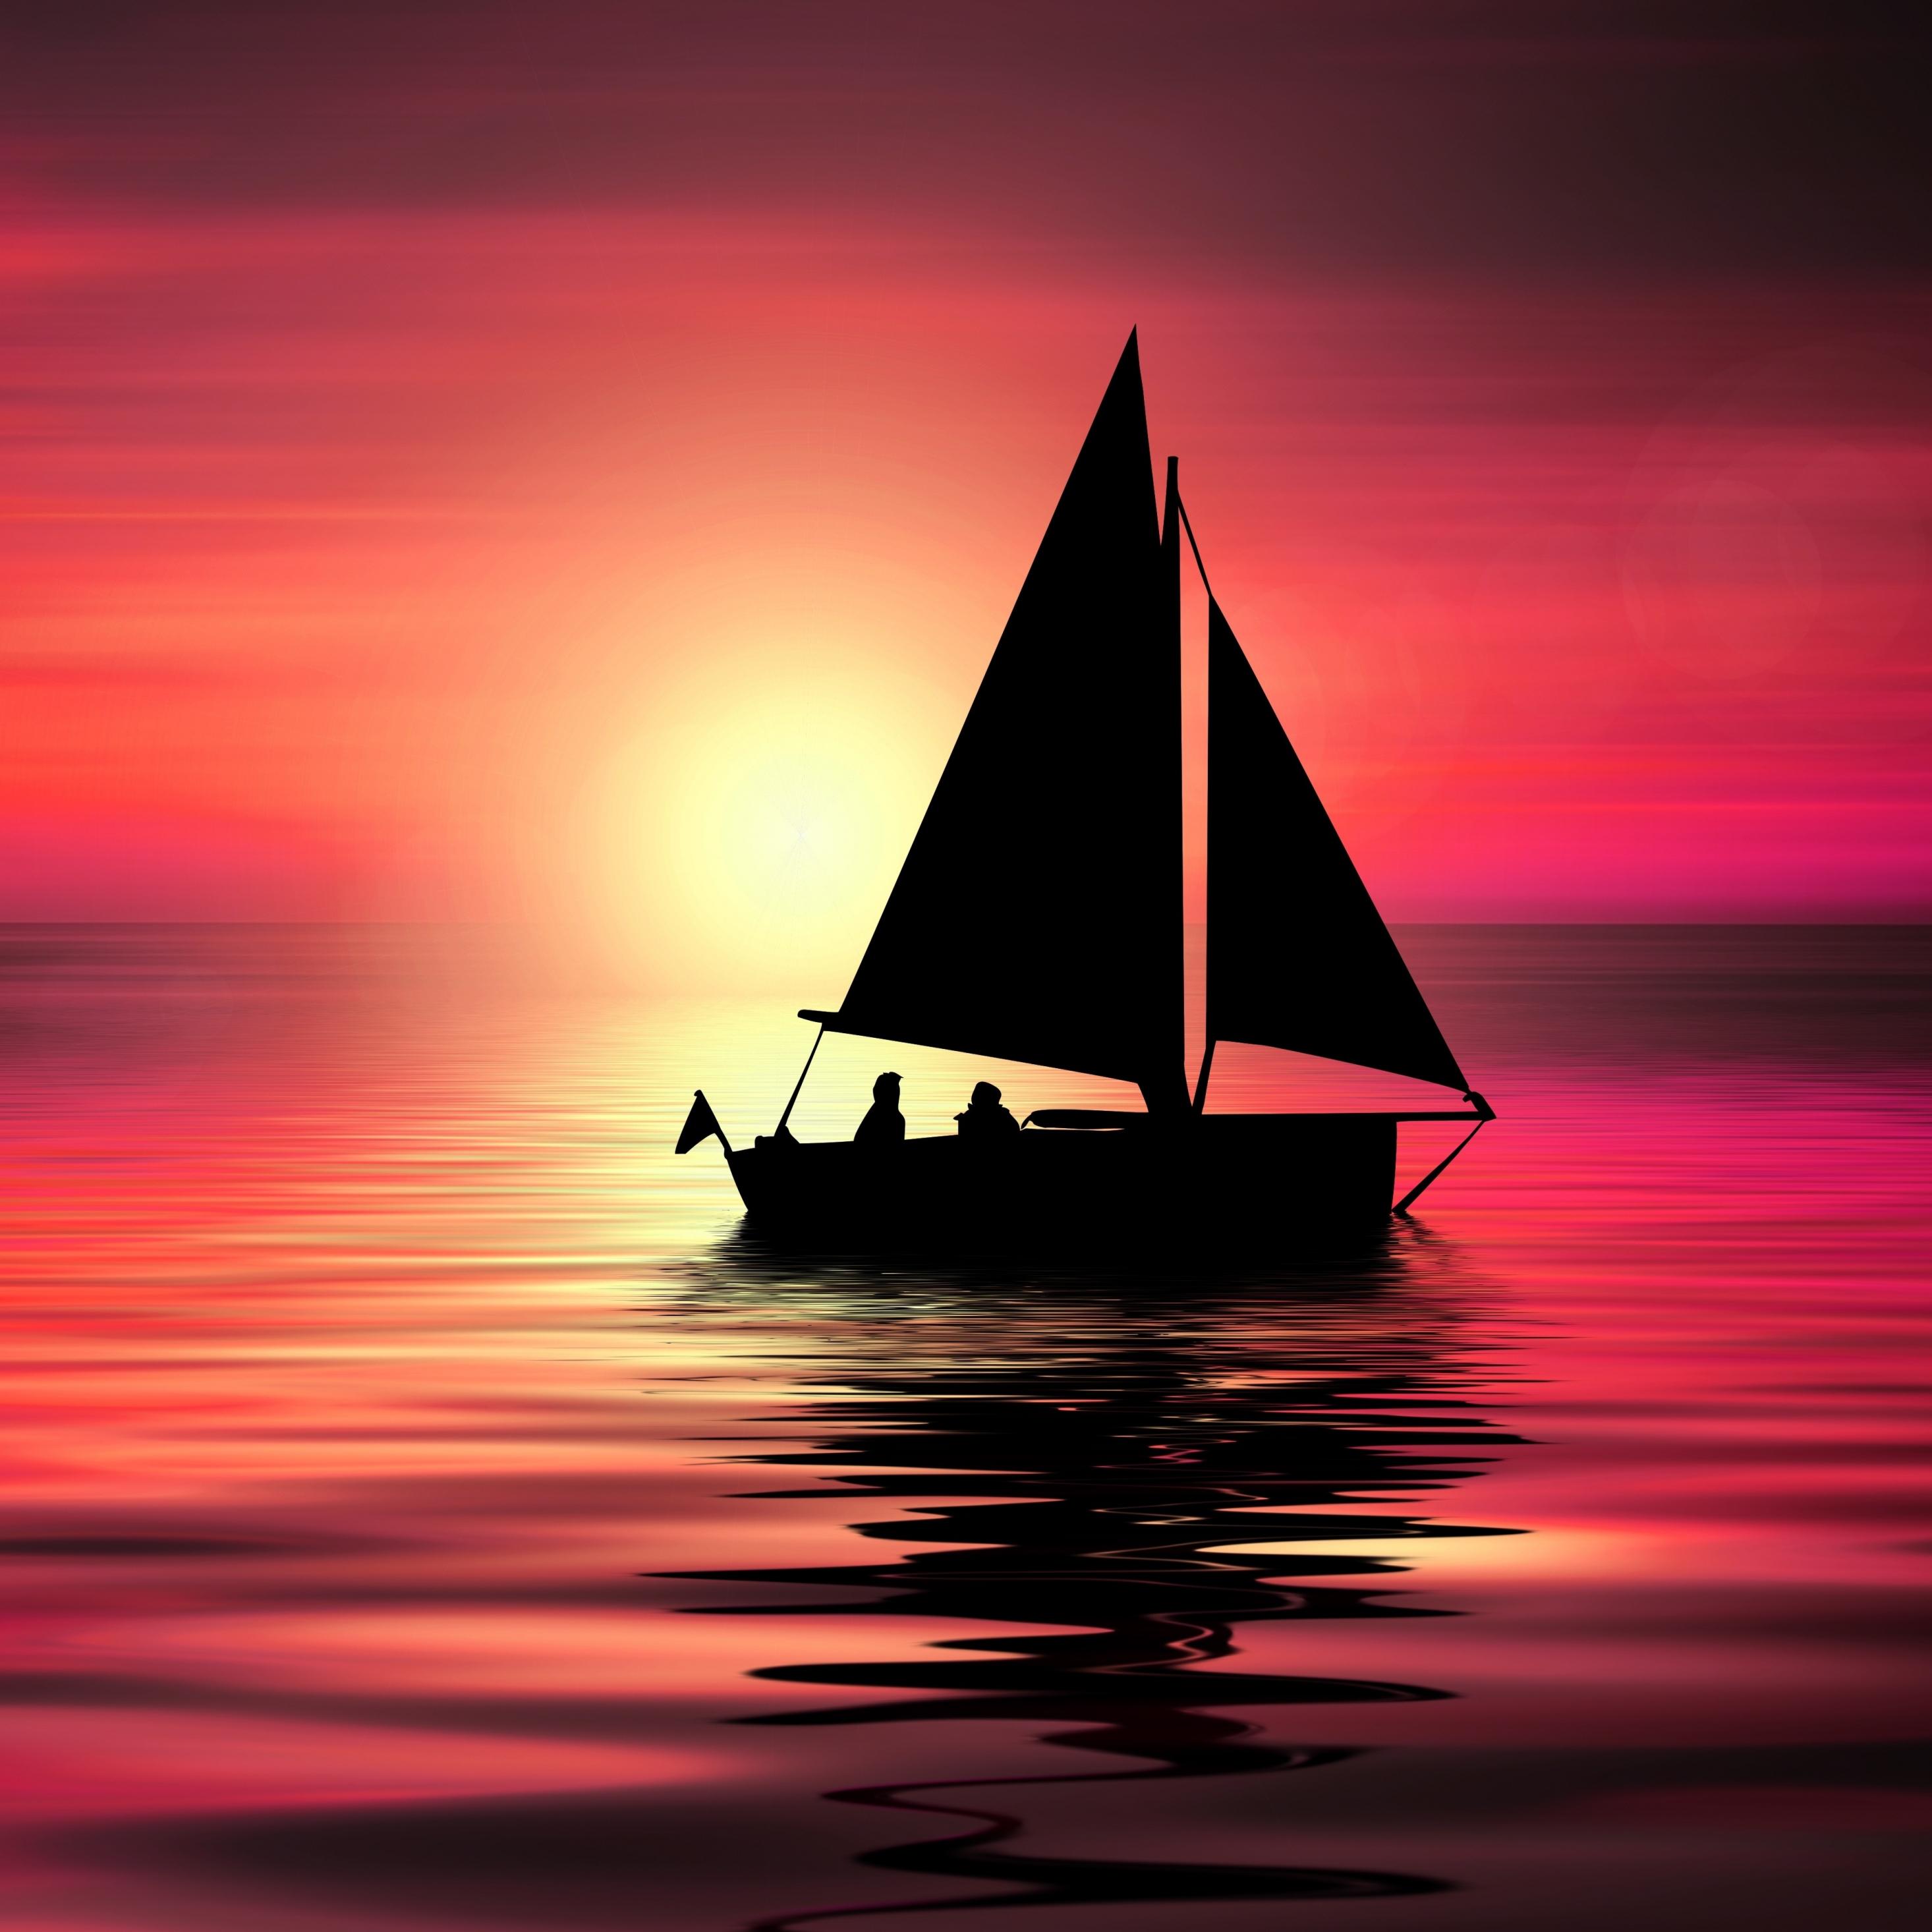 Artwork, sailboat, sunset, silhouette, 2932x2932 wallpaper